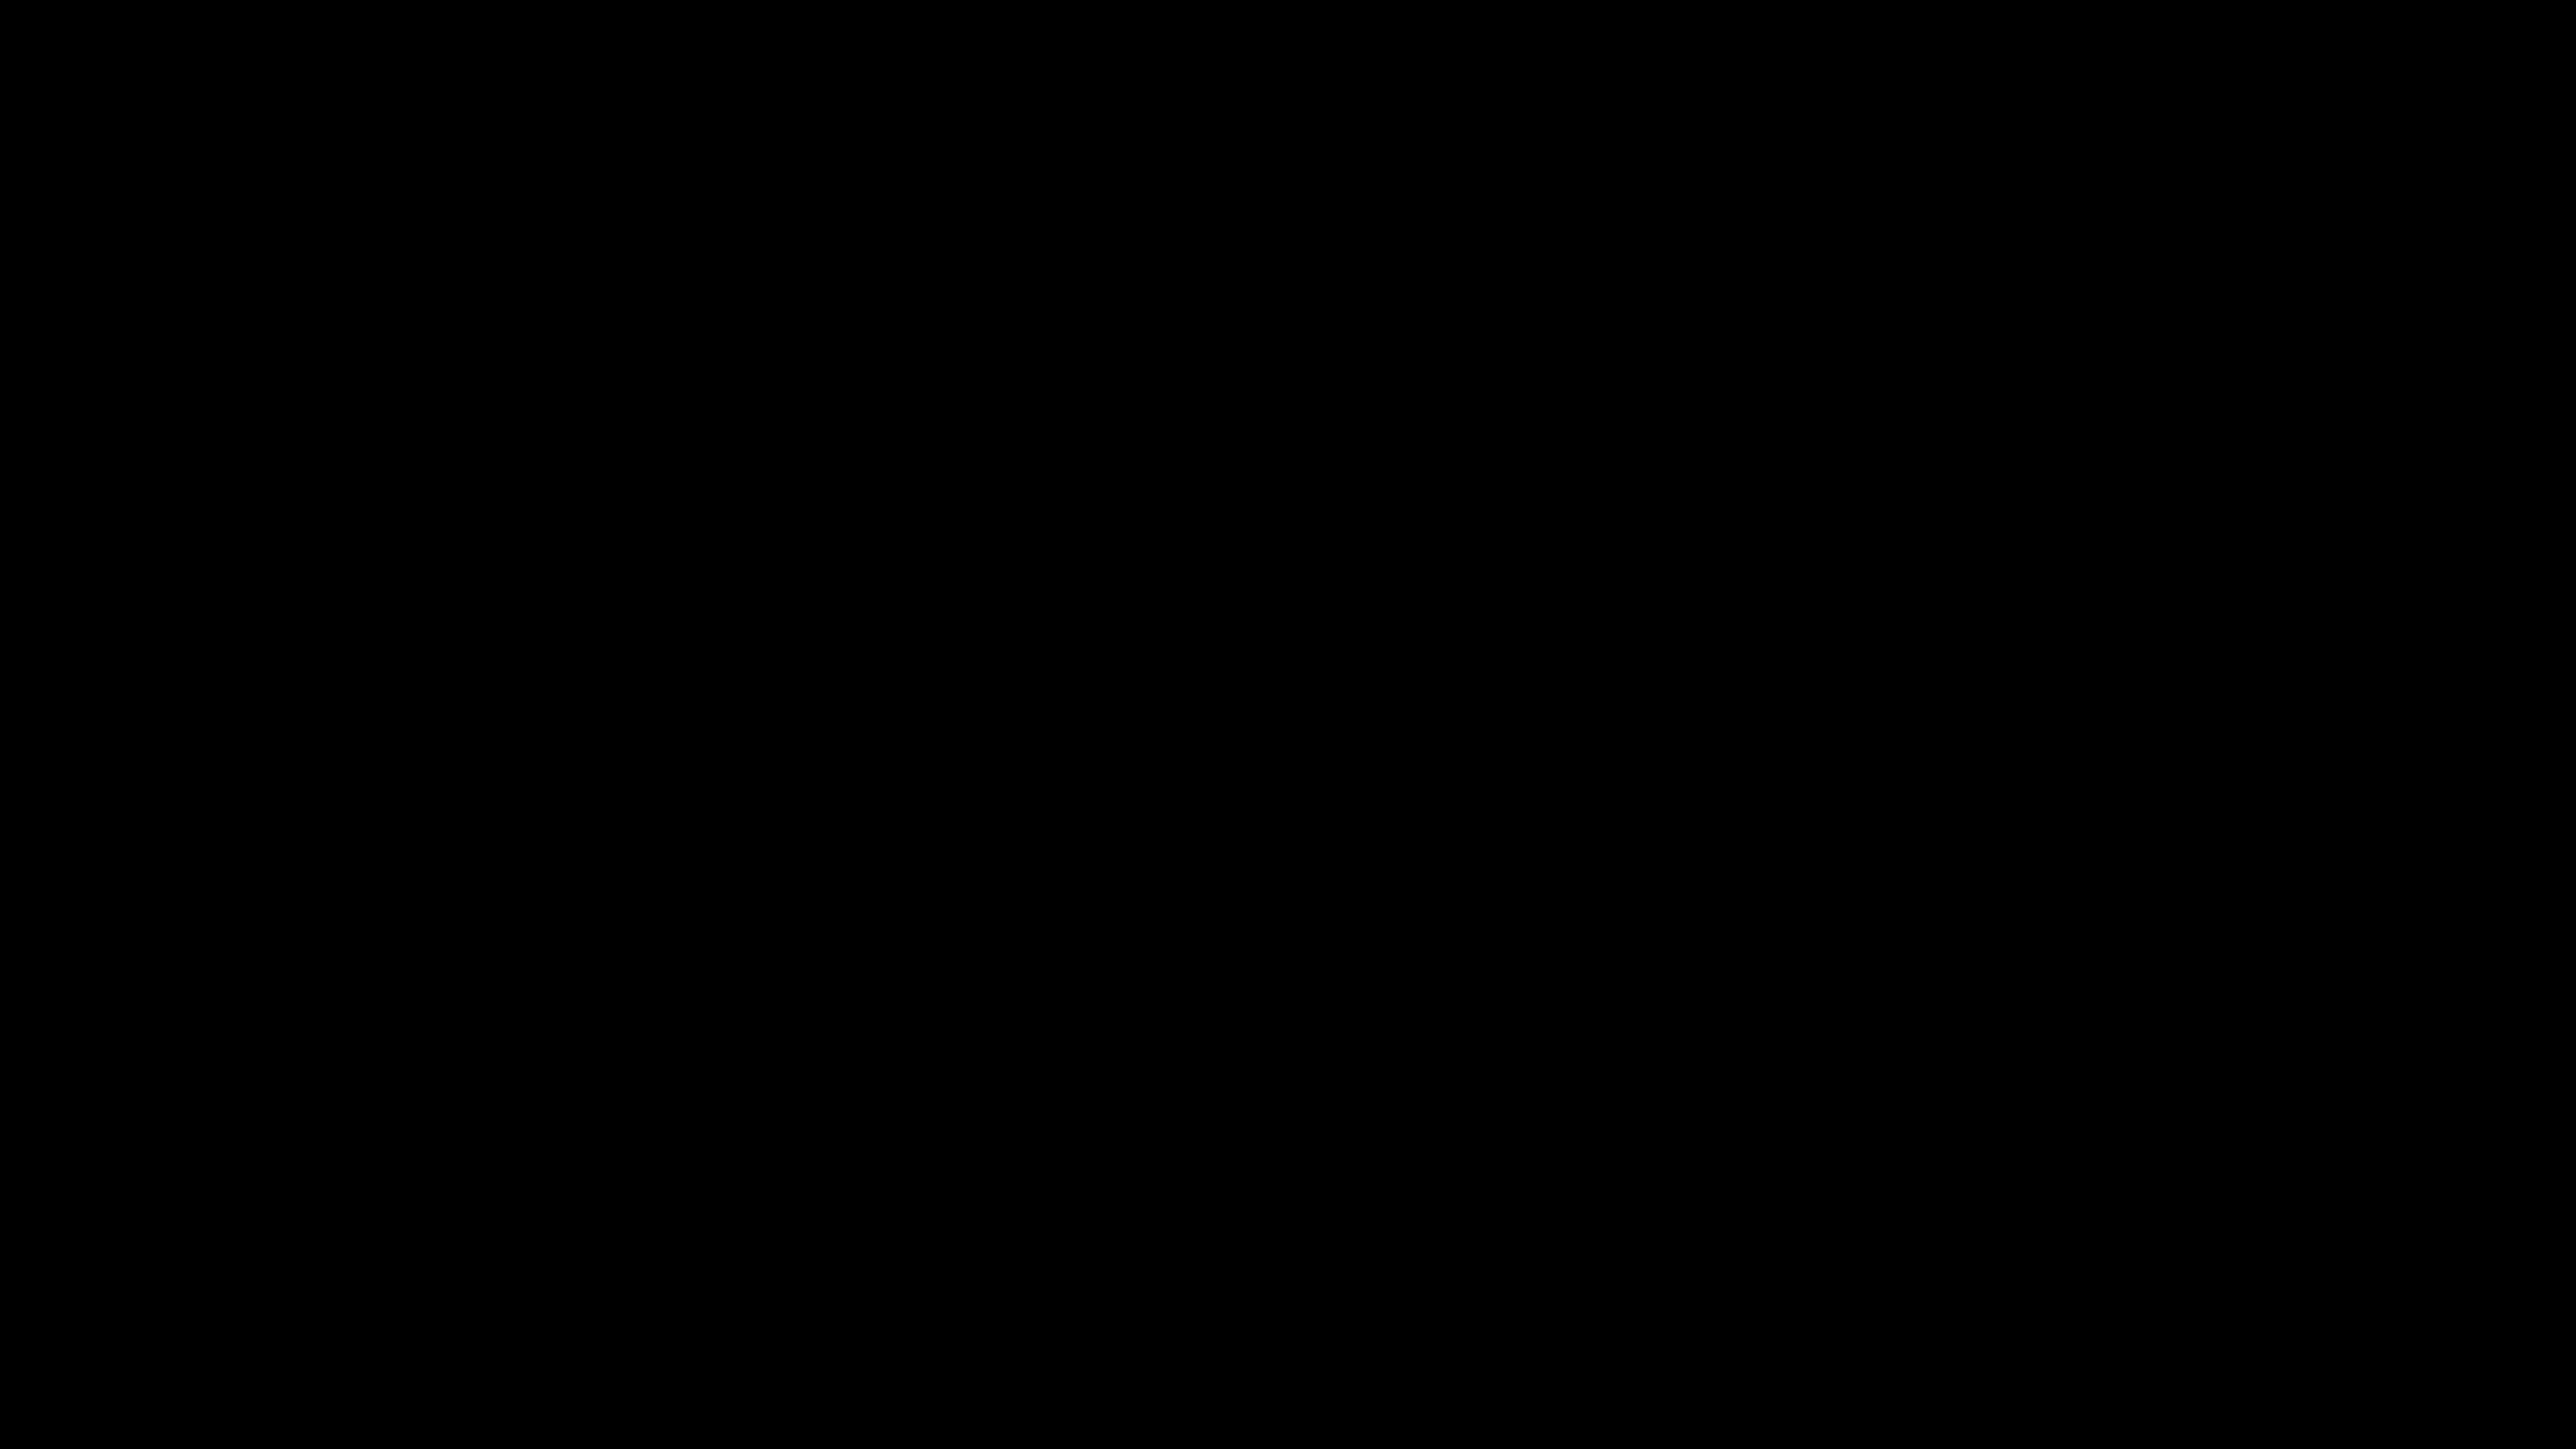 nx2a4379